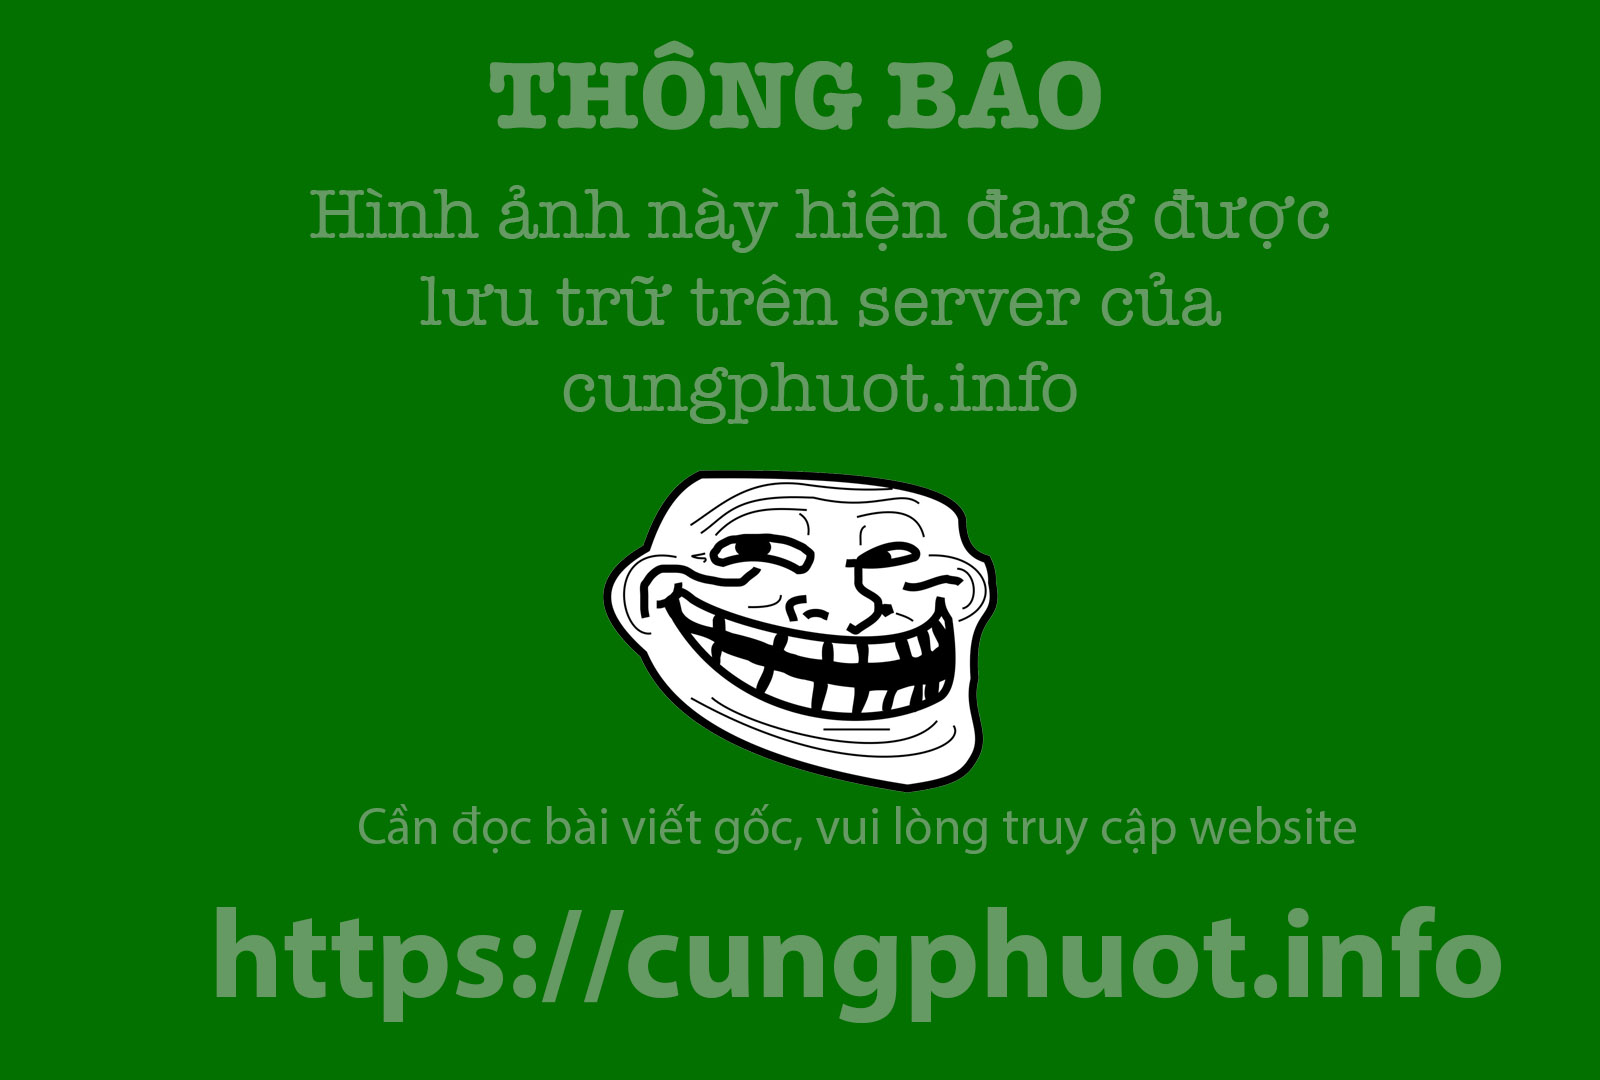 Den Moc Chau san mai anh dao hinh anh 16